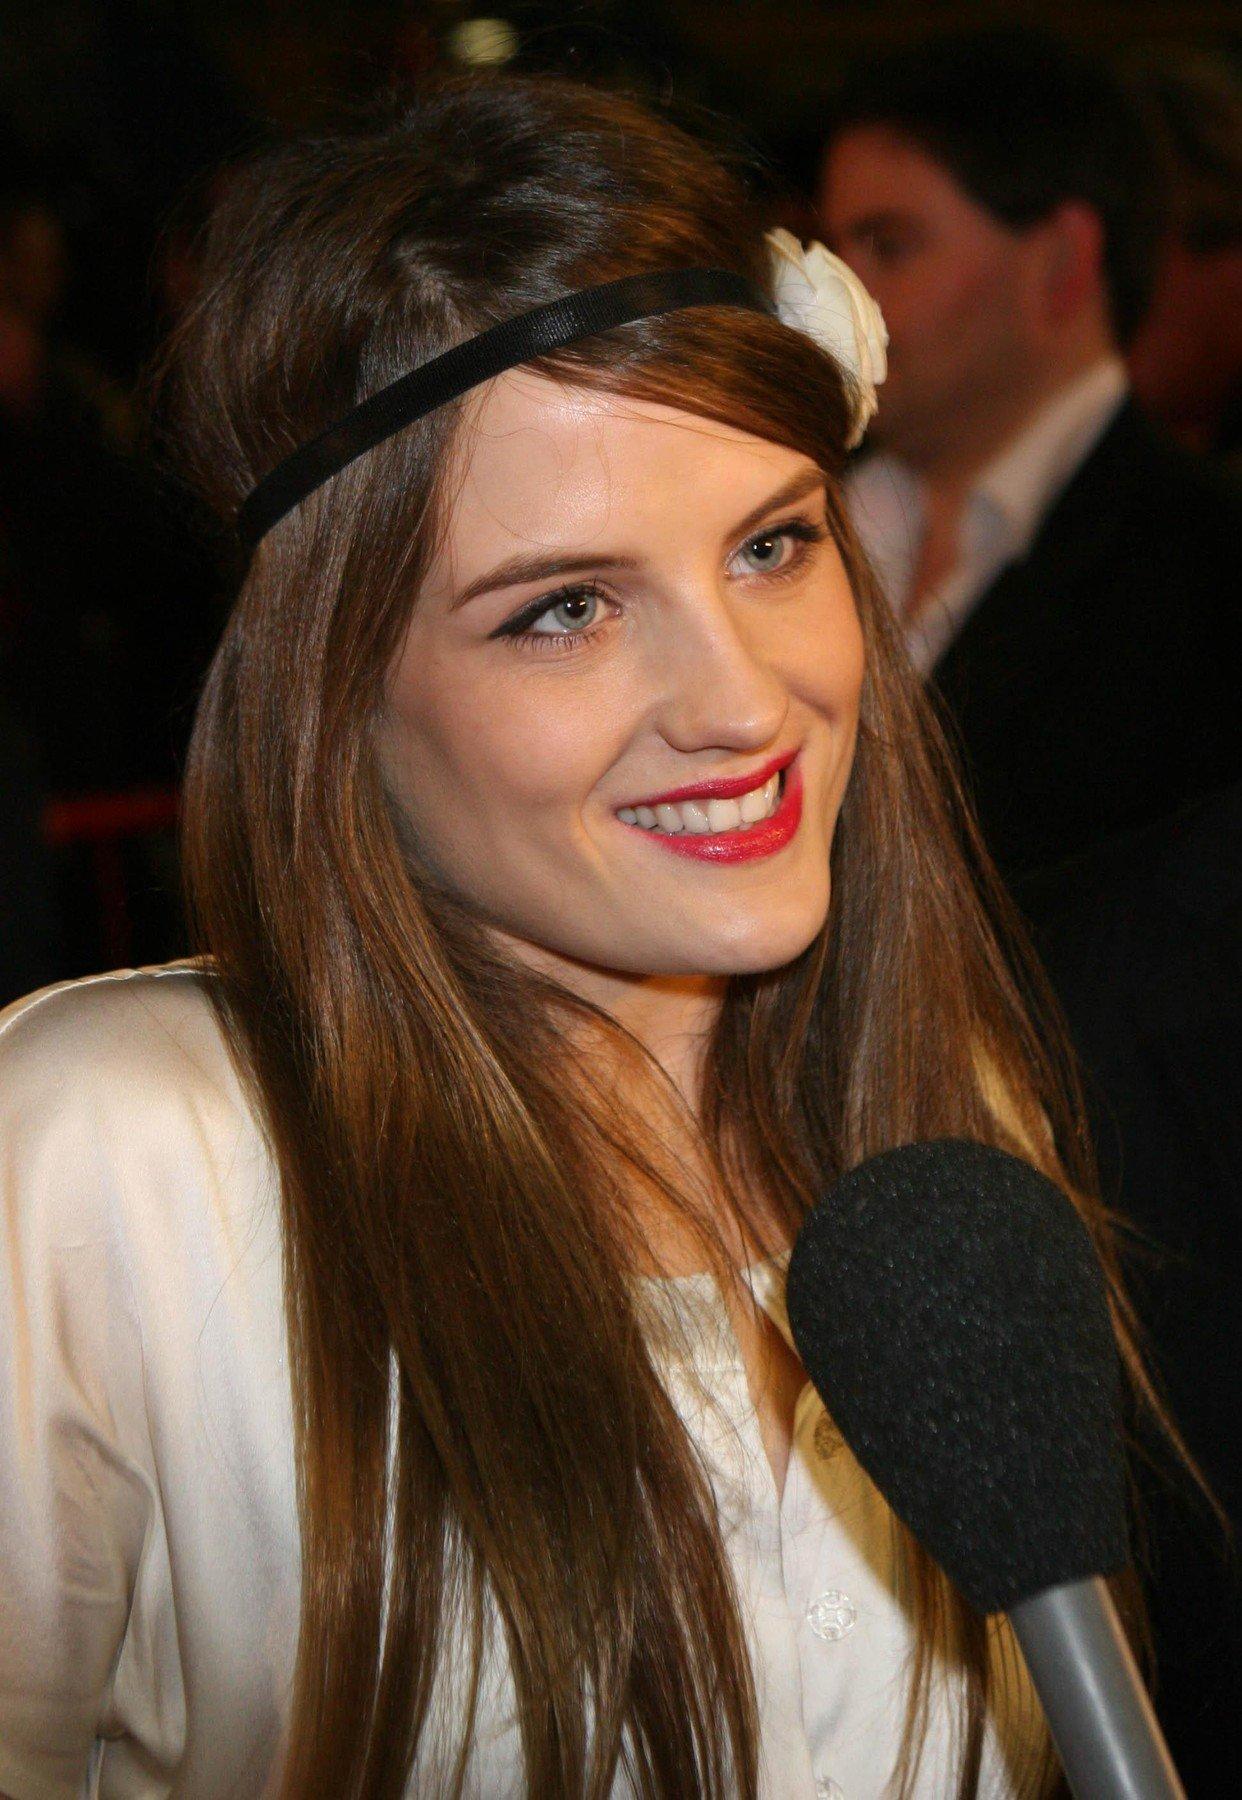 Danika McGuigan